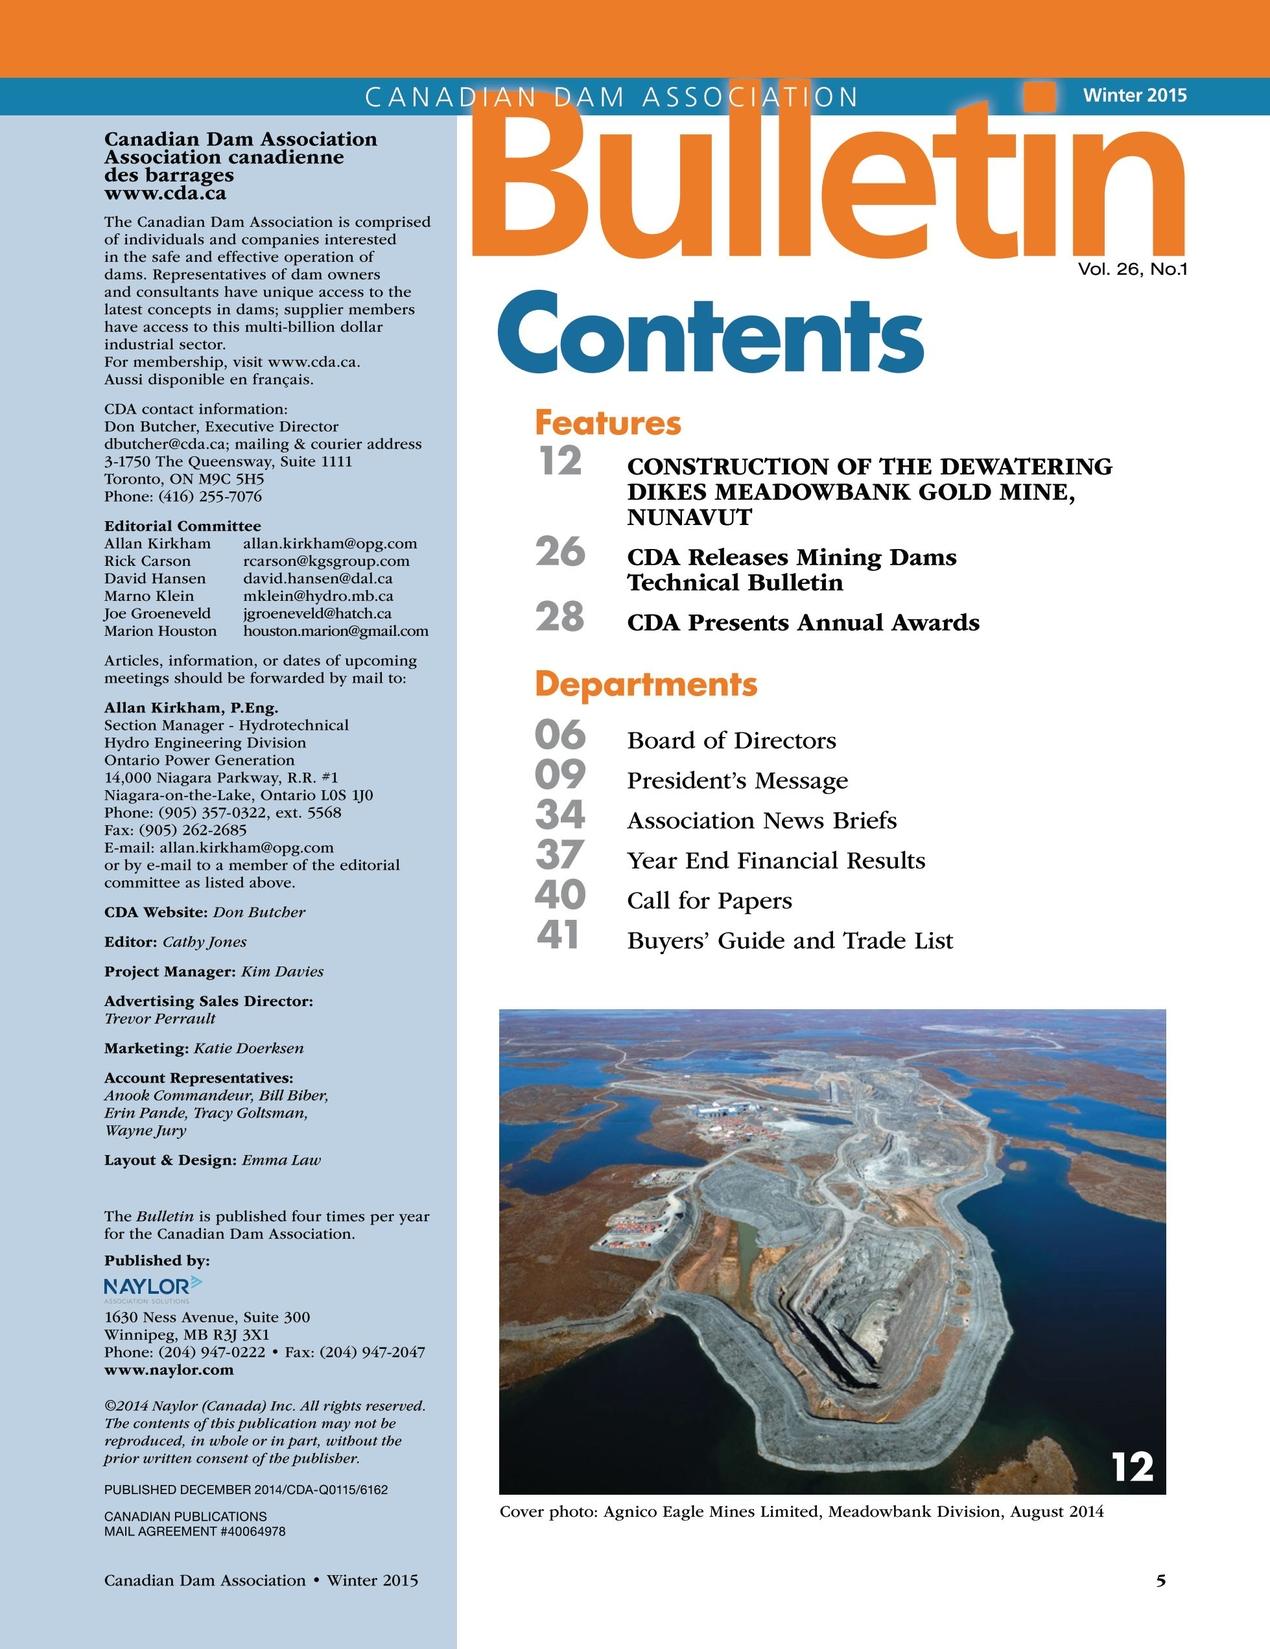 Canadian Dam Association Bulletin - Winter 2015